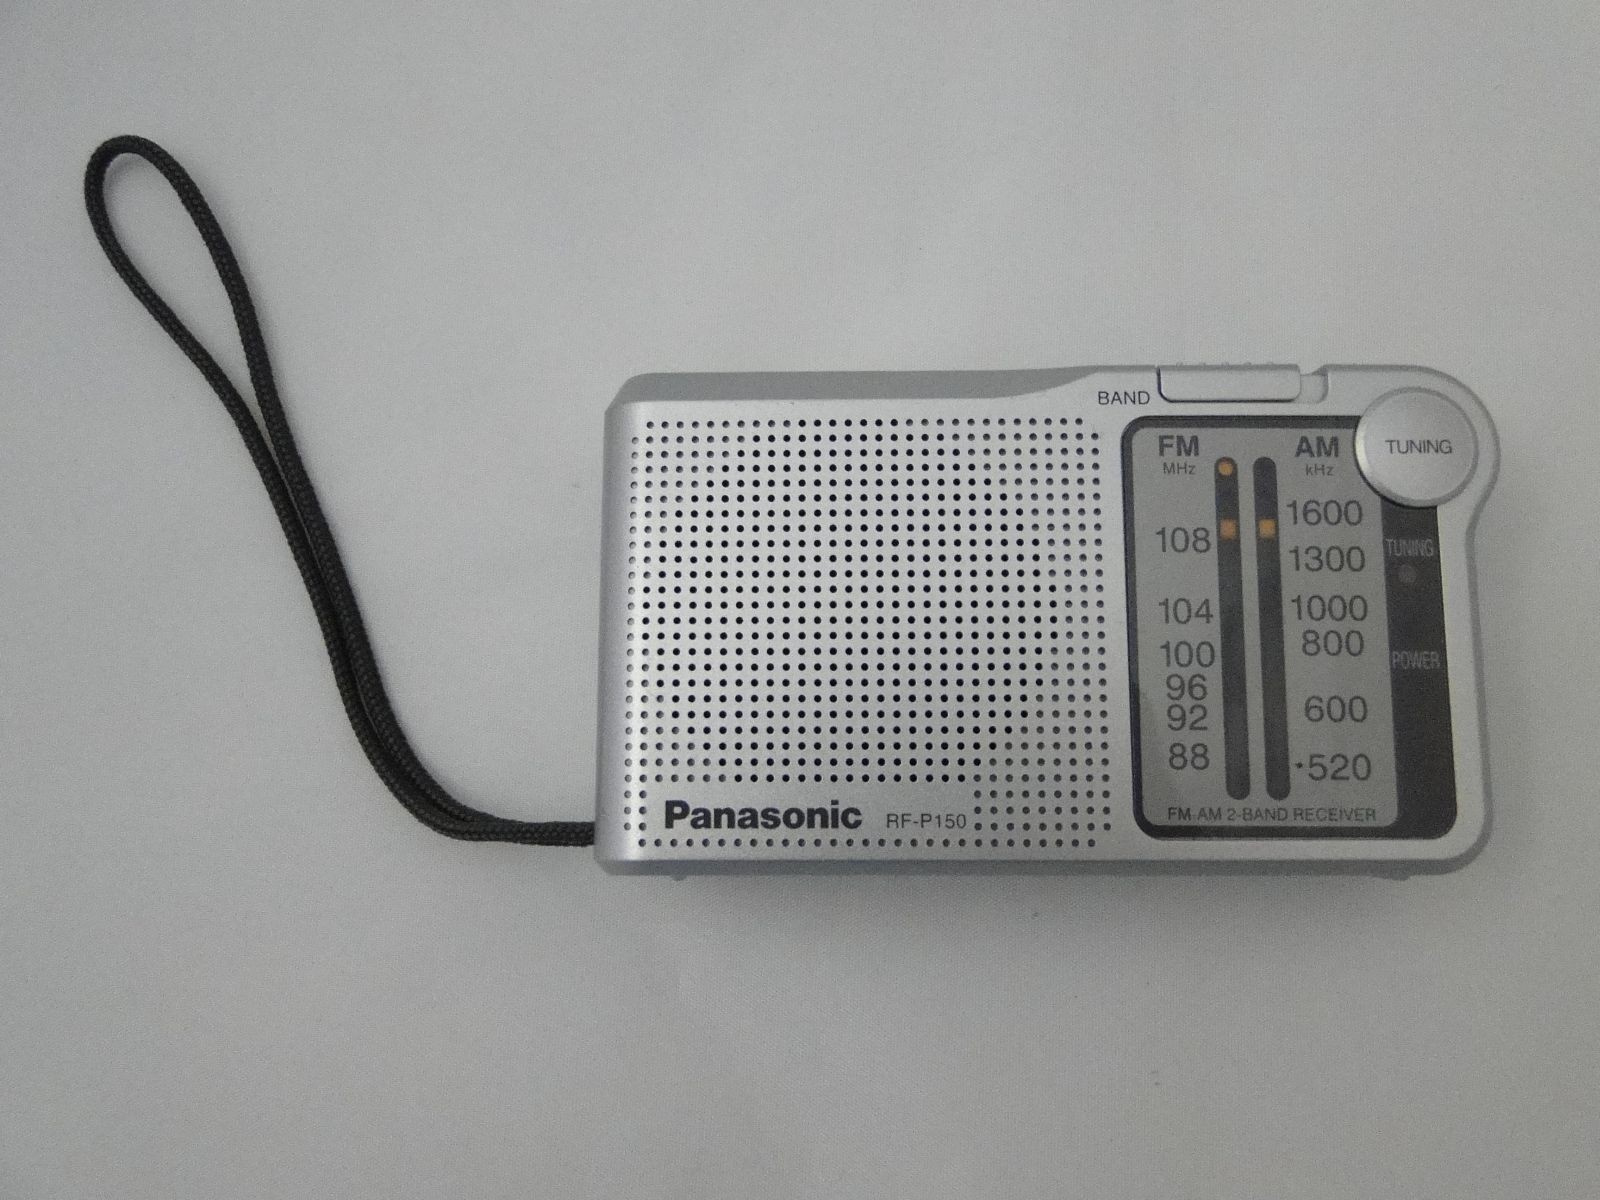 DSC08663.JPG (1600×1200)